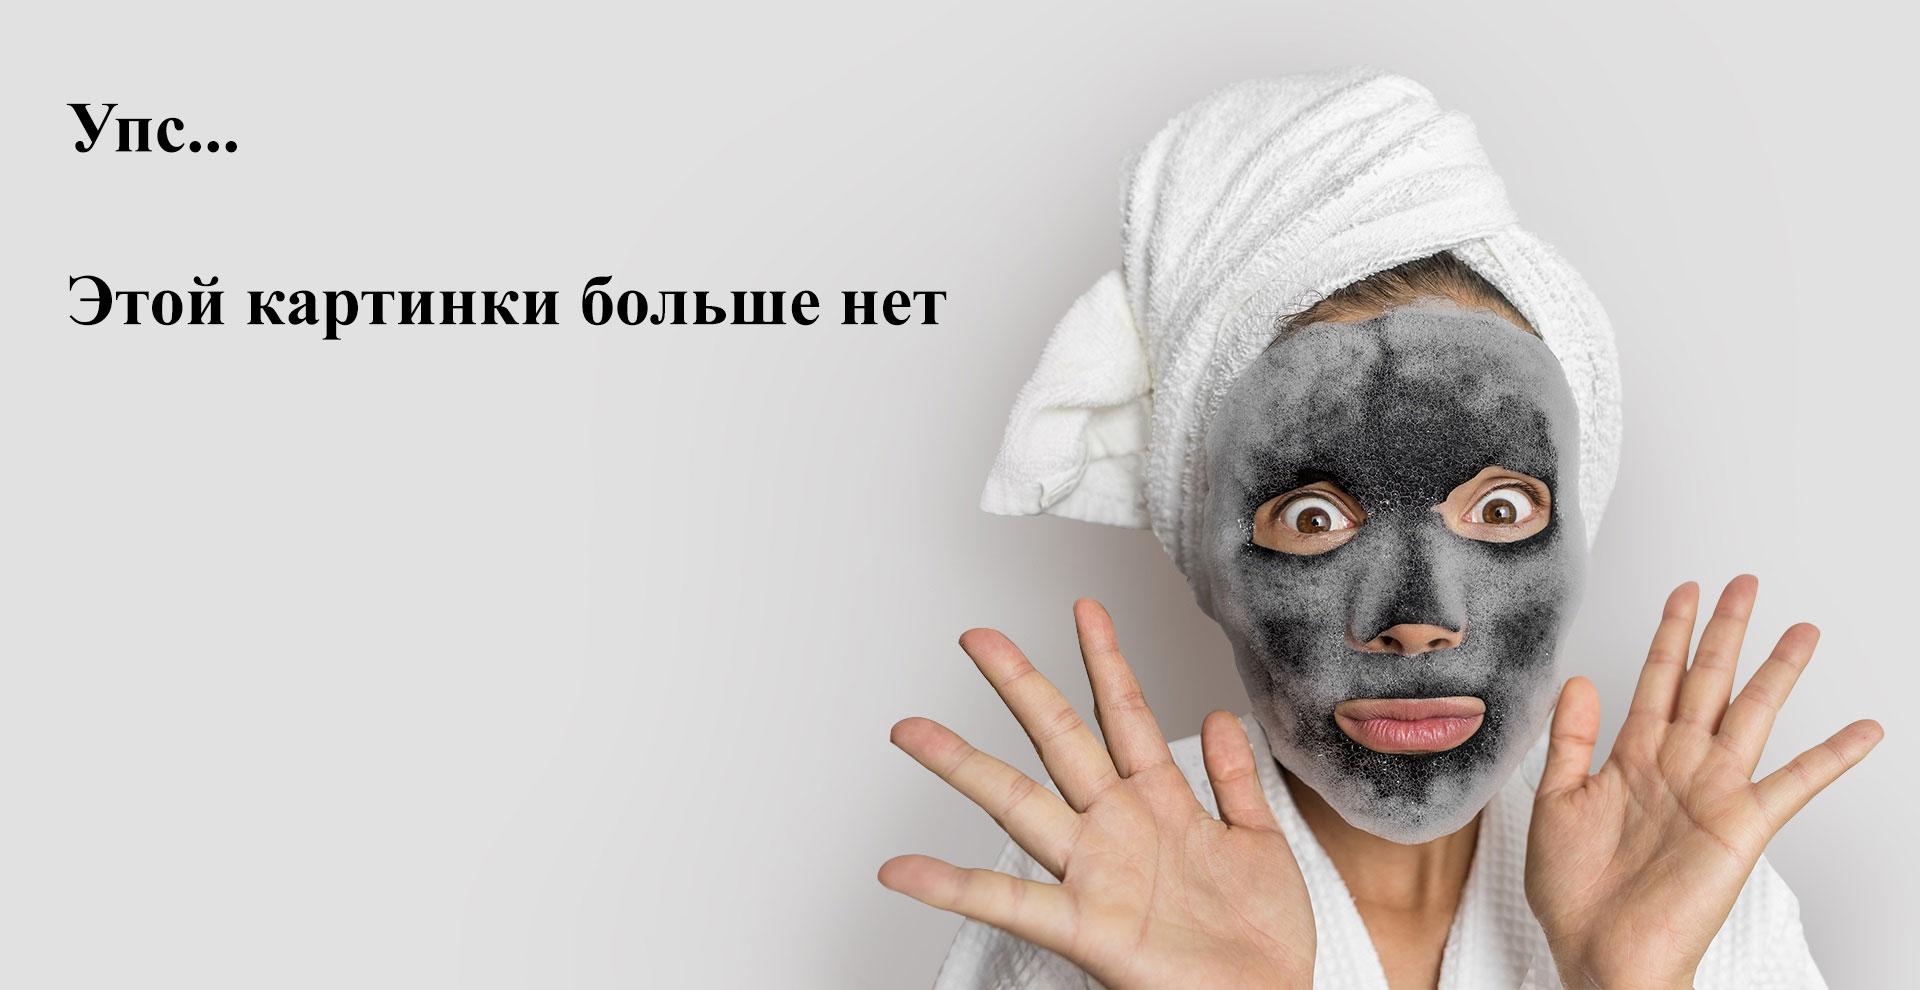 John Frieda, Шампунь для волос Miraculous Recovery, 250 мл